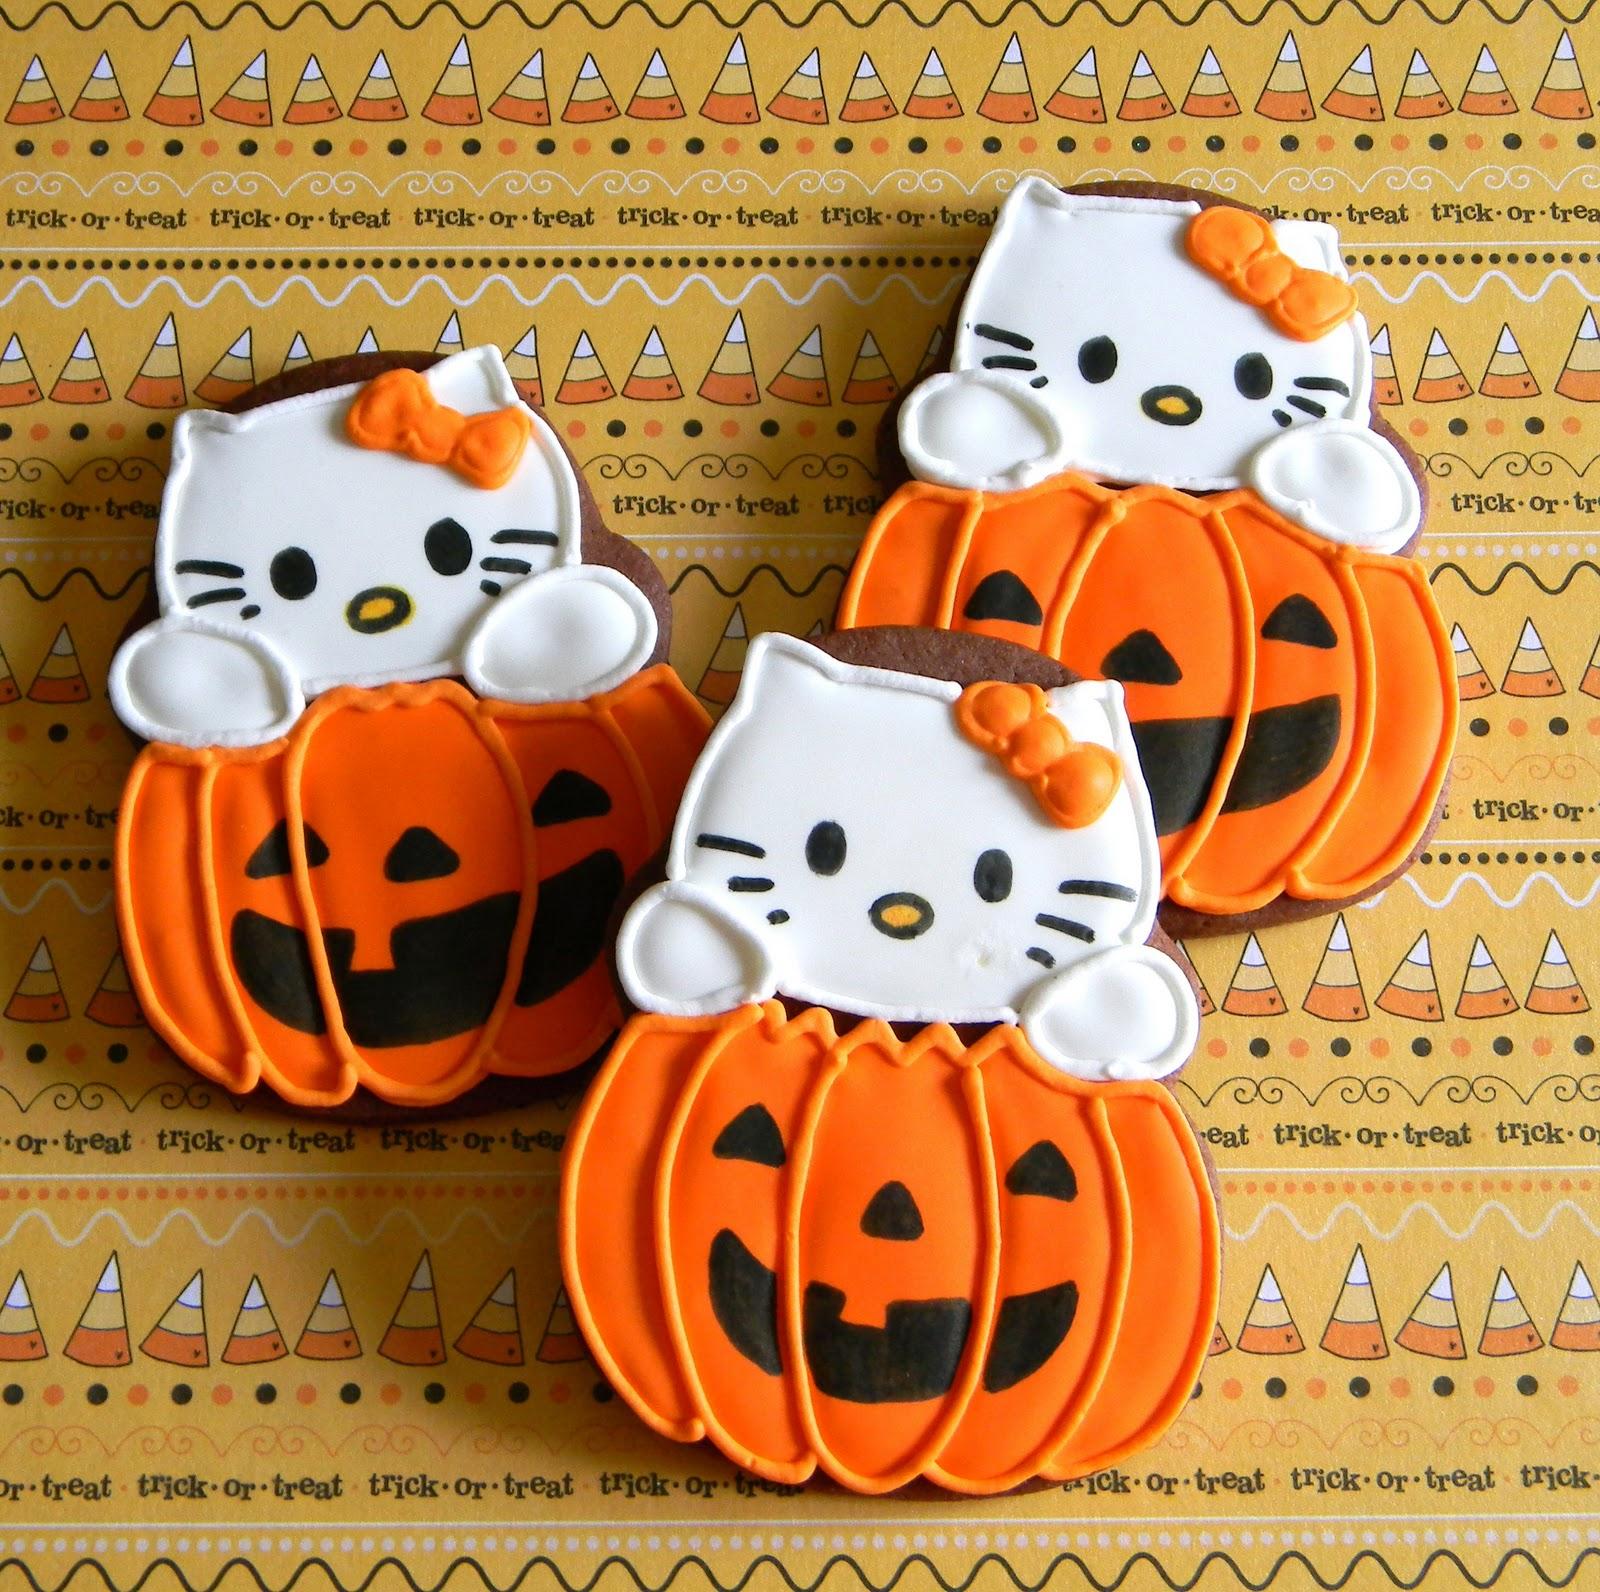 Frost your cake zombies vs hello kitty - Hello kitty halloween ...